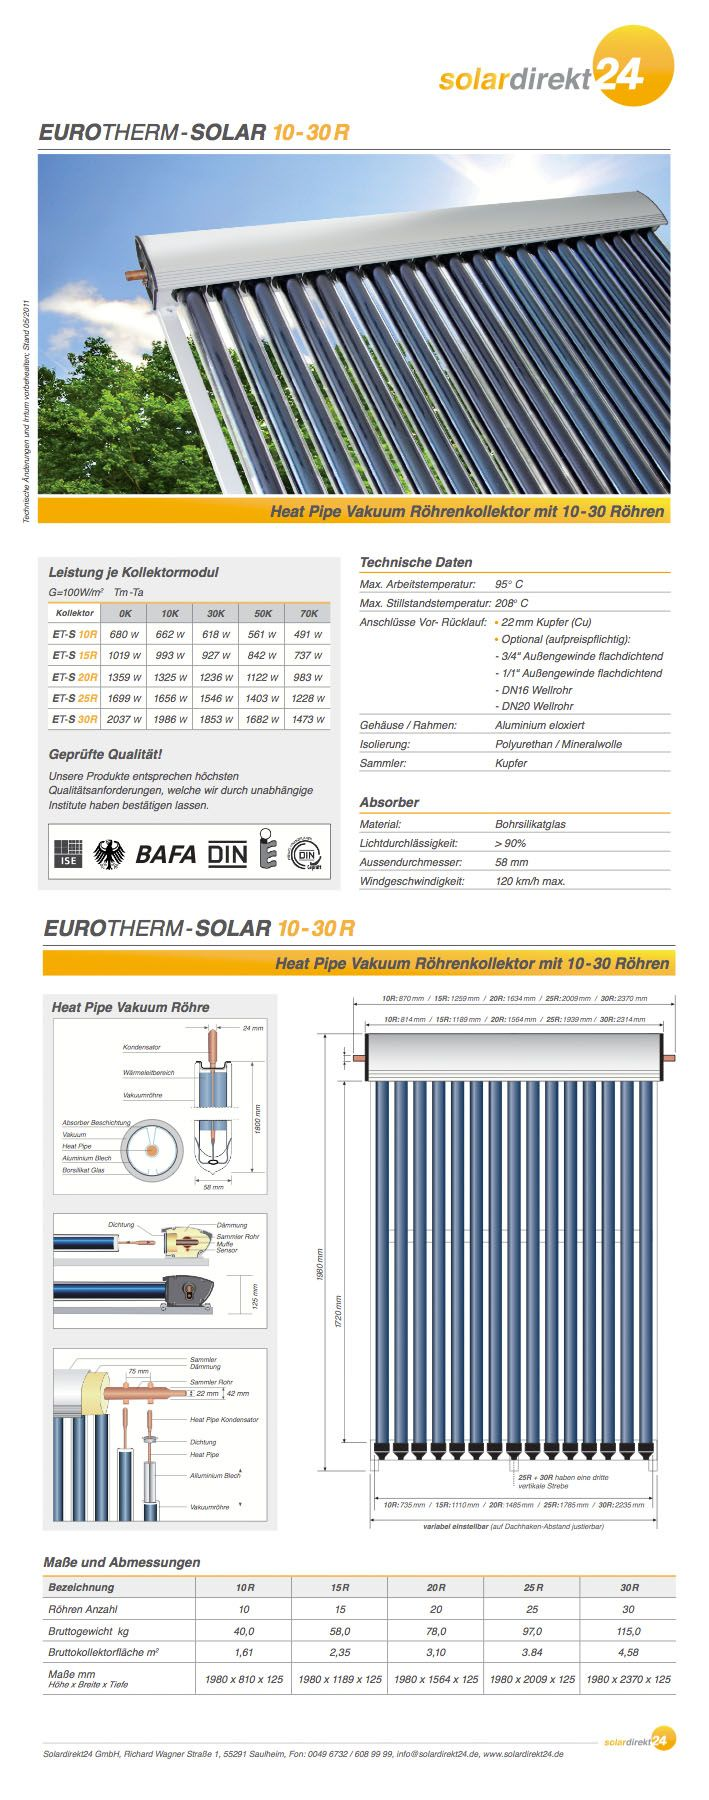 Datenblatt zu unseren Eurotherm Kollektoren  #Eurotherm-Solar #Solarthermie #Vakuumröhrenkollektoren